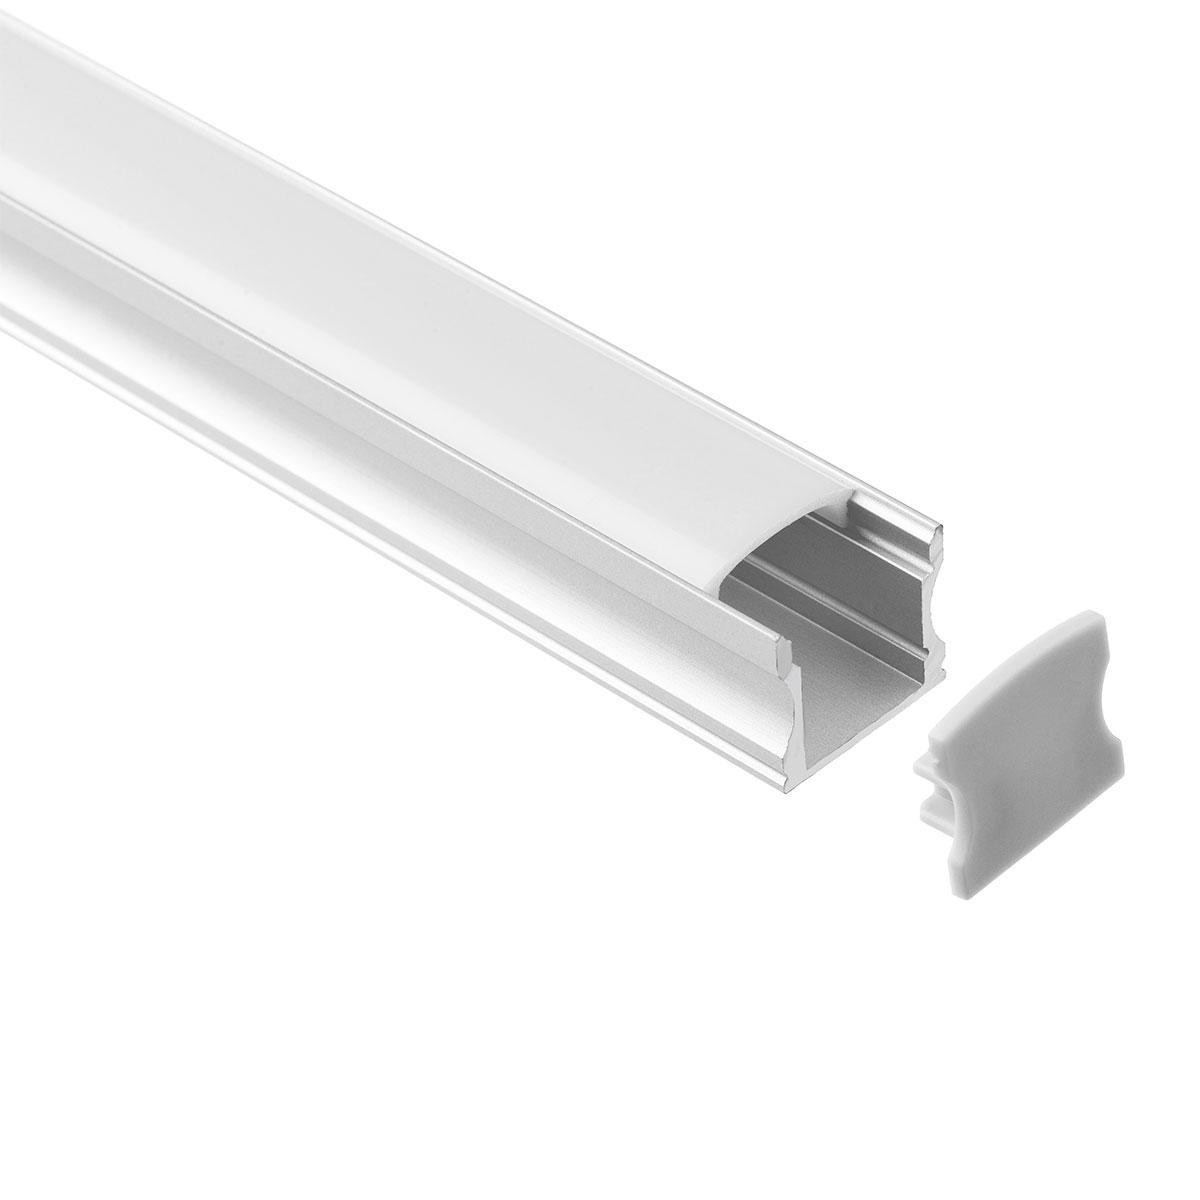 LED Aufbau U-Profil eloxiert 17,3 x 14,5mm opal 200cm